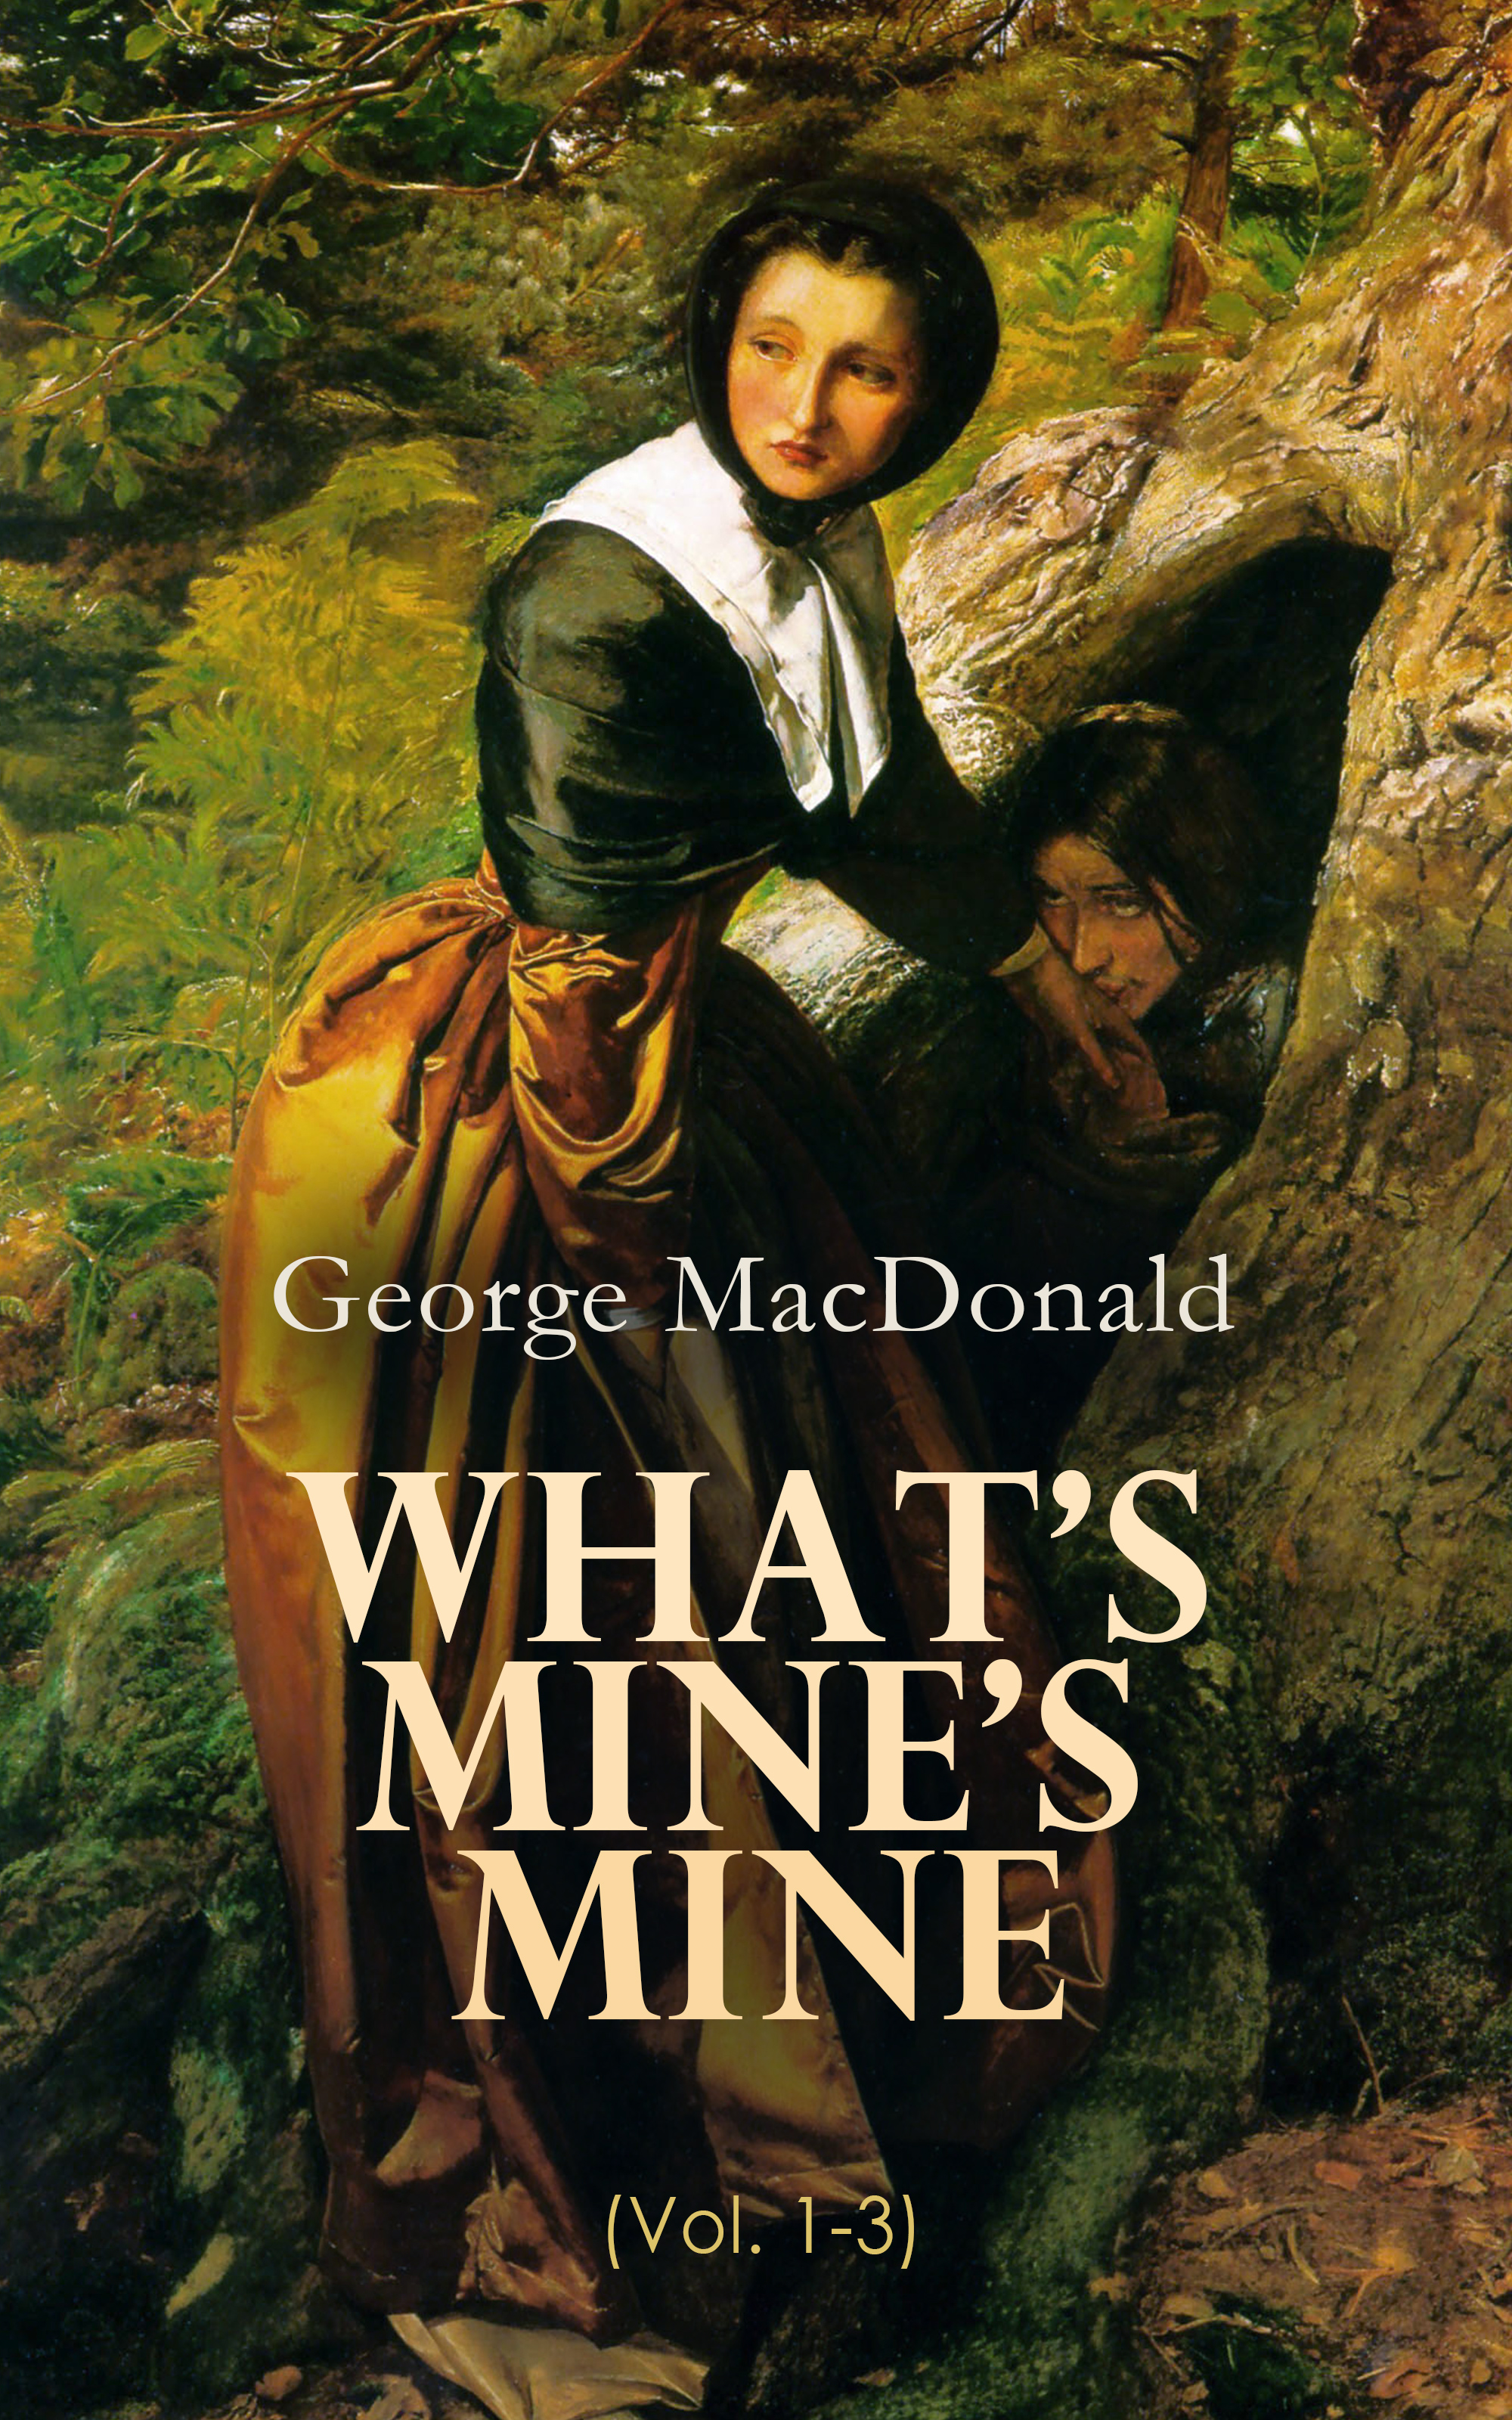 George MacDonald What's Mine's Mine (Vol. 1-3)